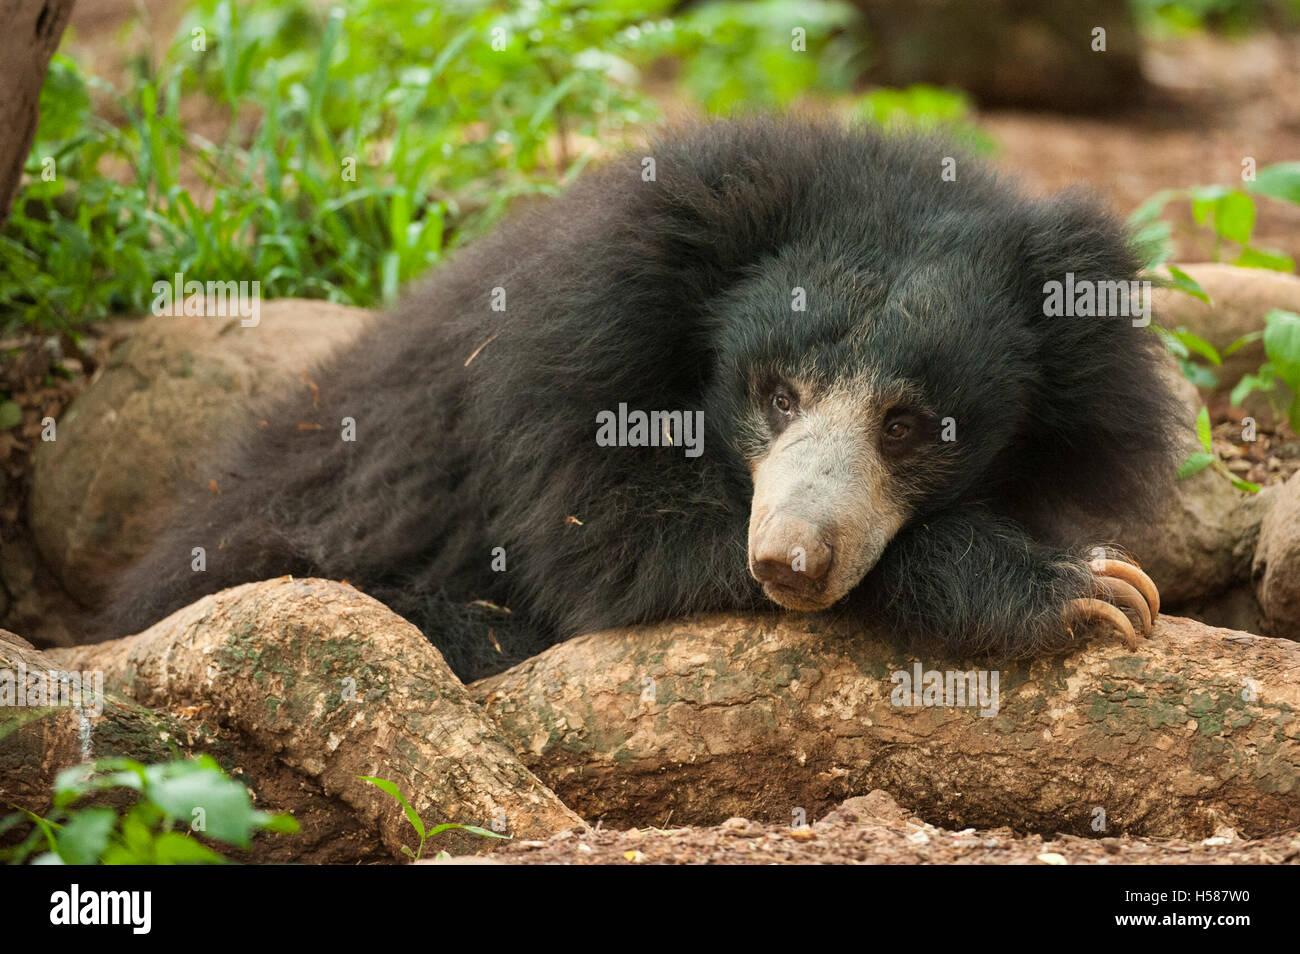 Sloth bear (Melursus ursinus), Sri Lanka - Stock Image